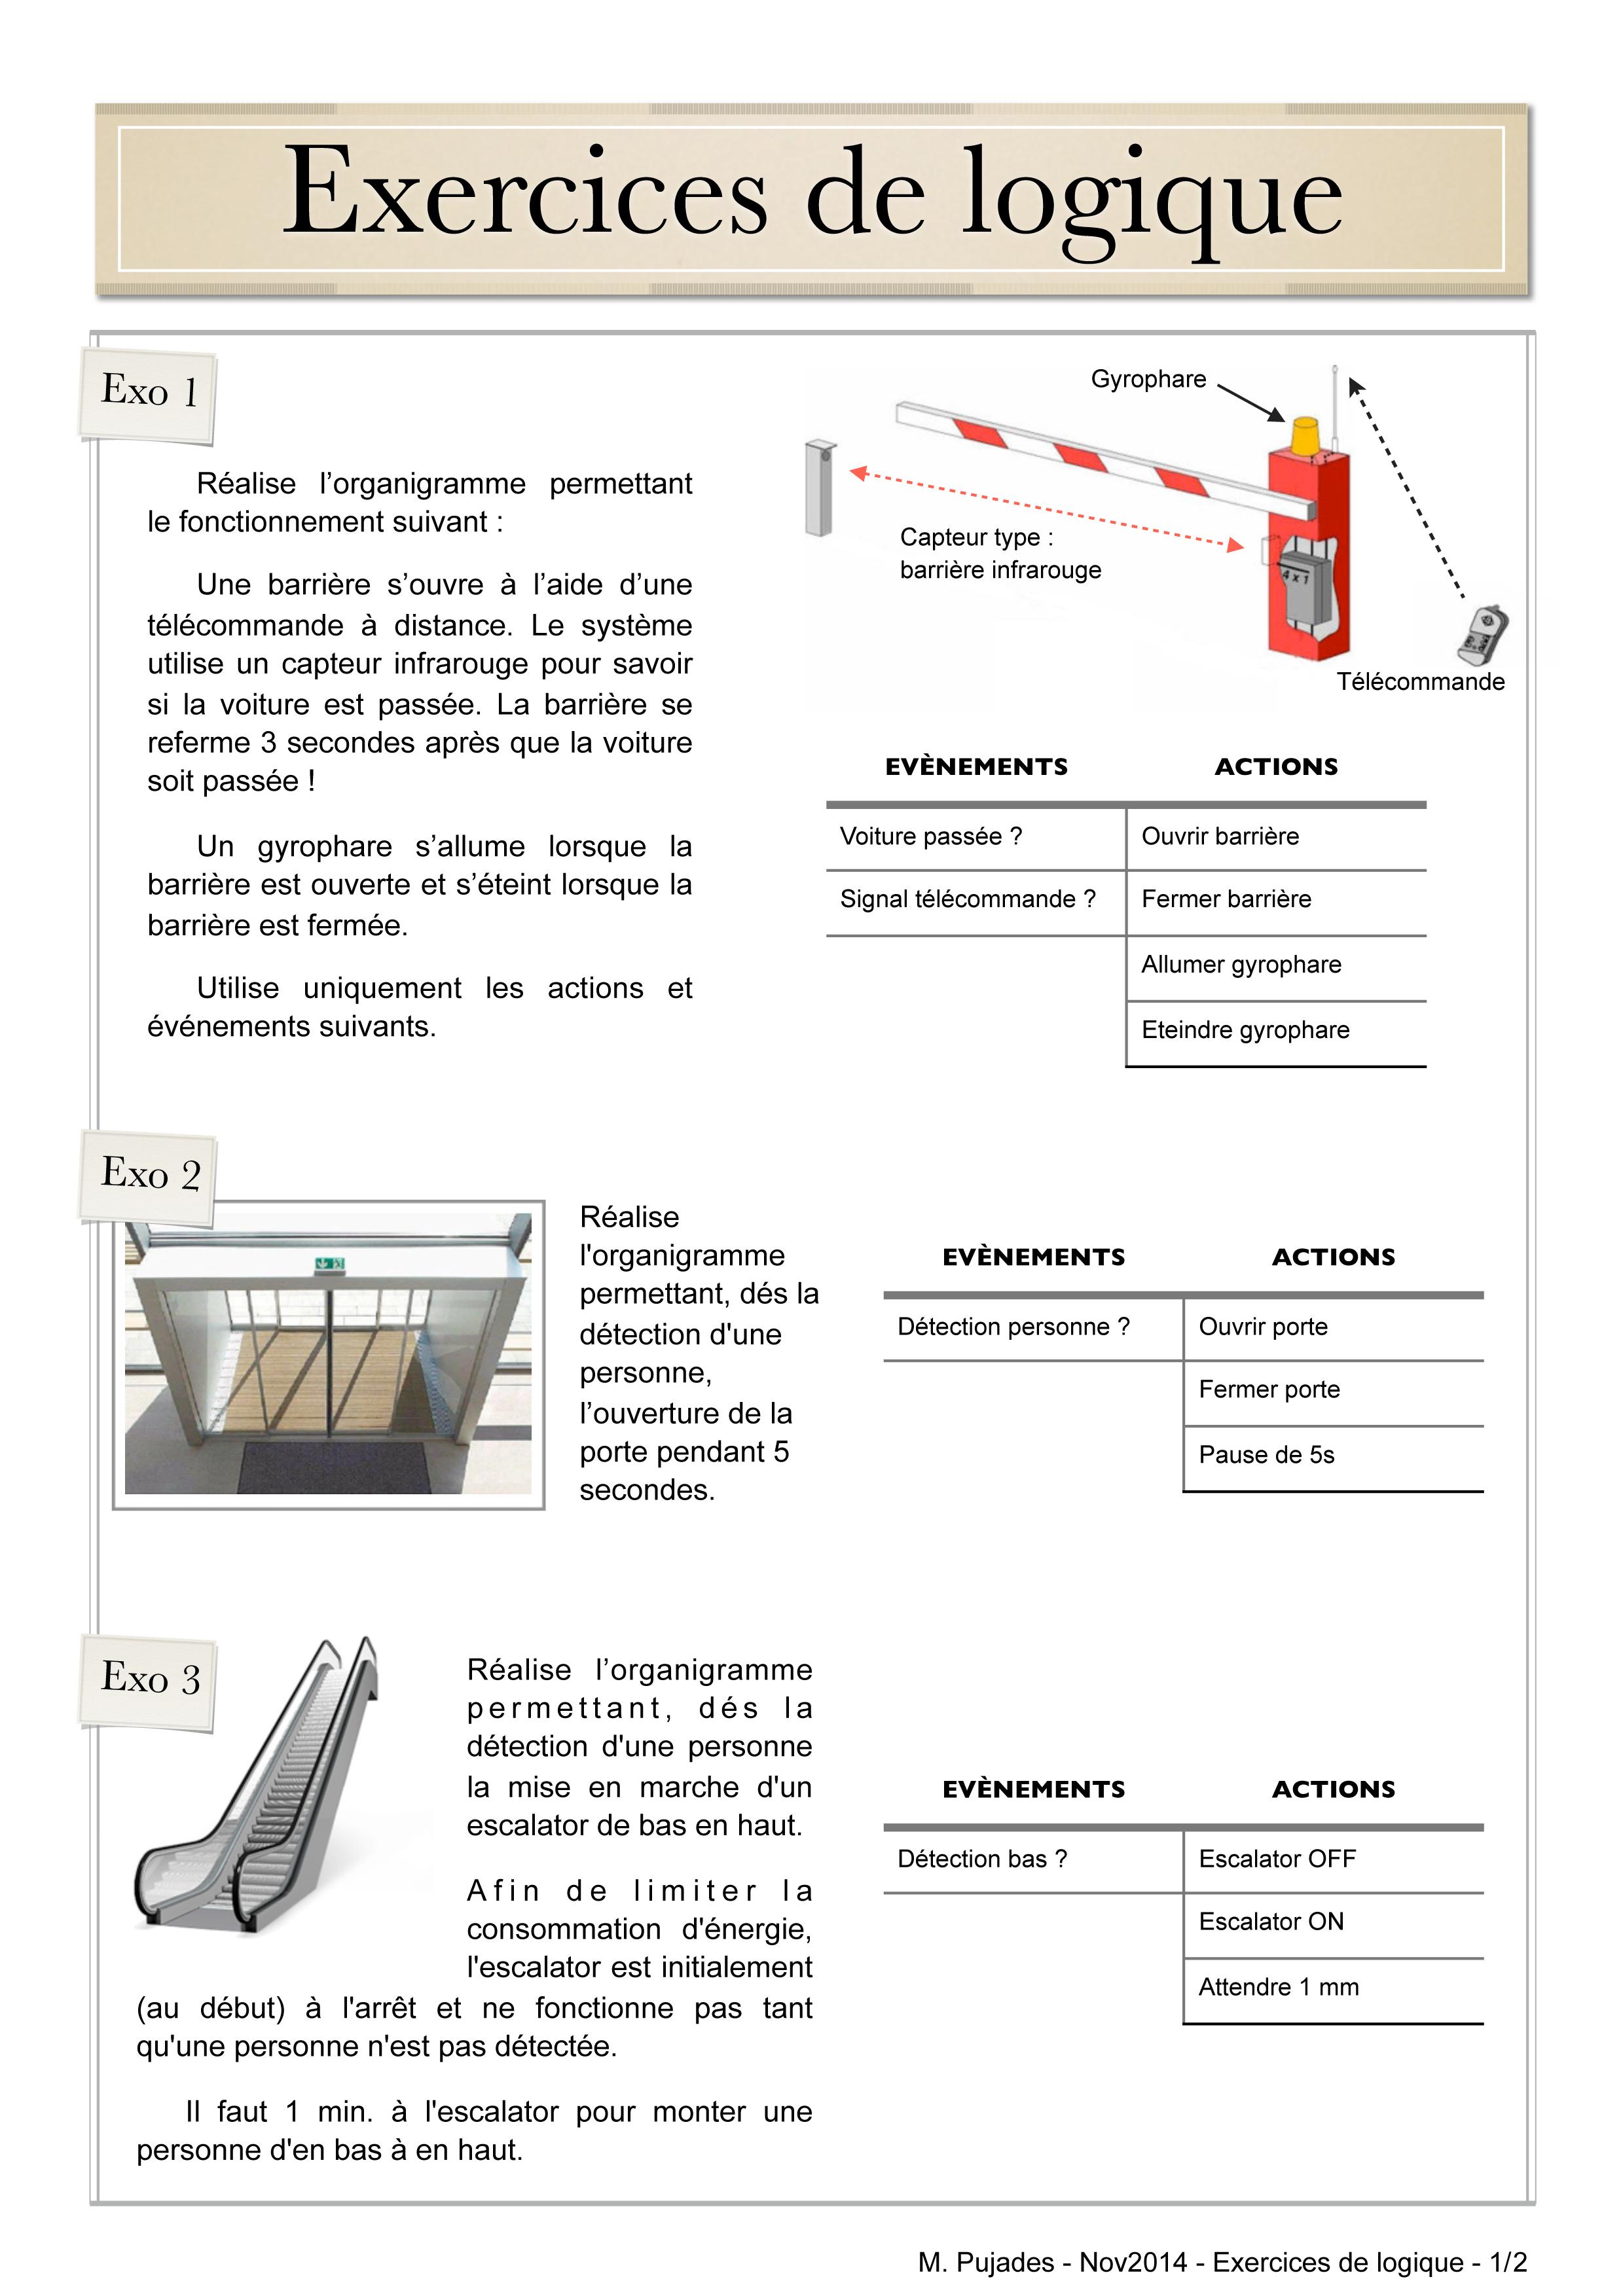 Technologie LOSFELD - Decouverte programmation, organigramme